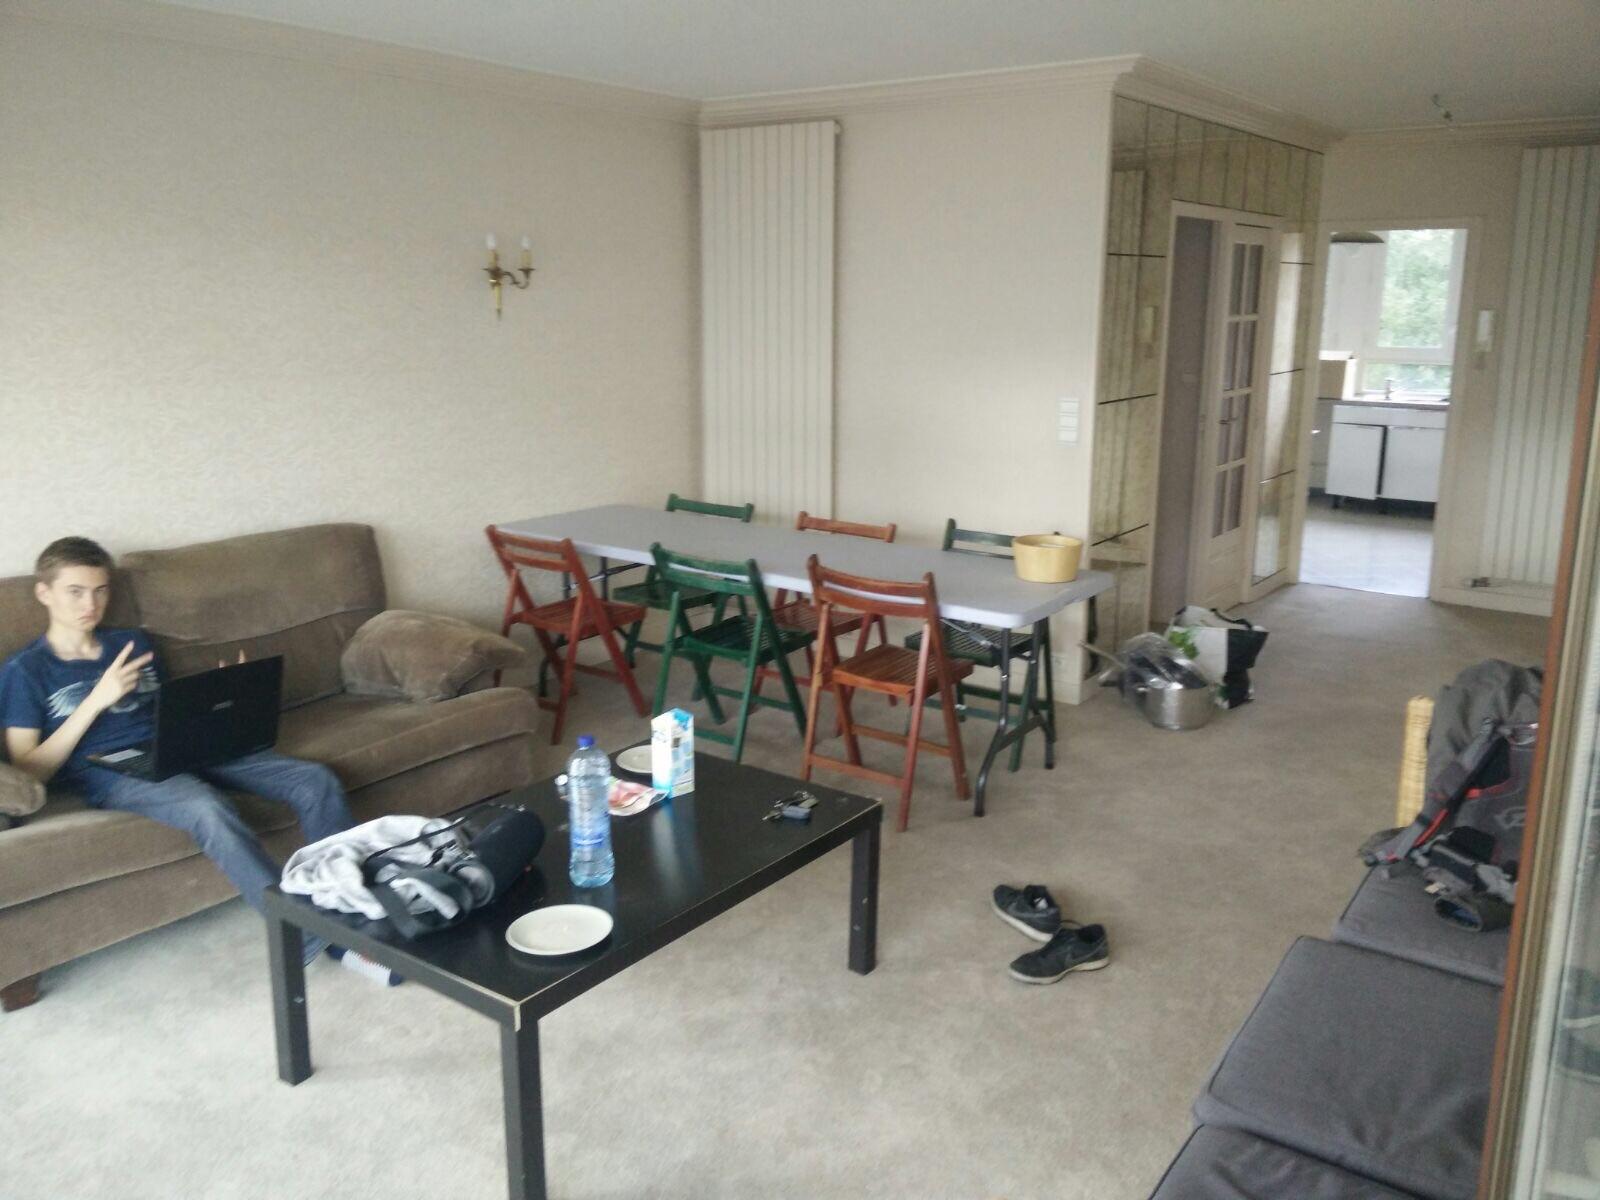 apartment-near-rennes-center-e0ef878b6378060fd4165b556dadd261